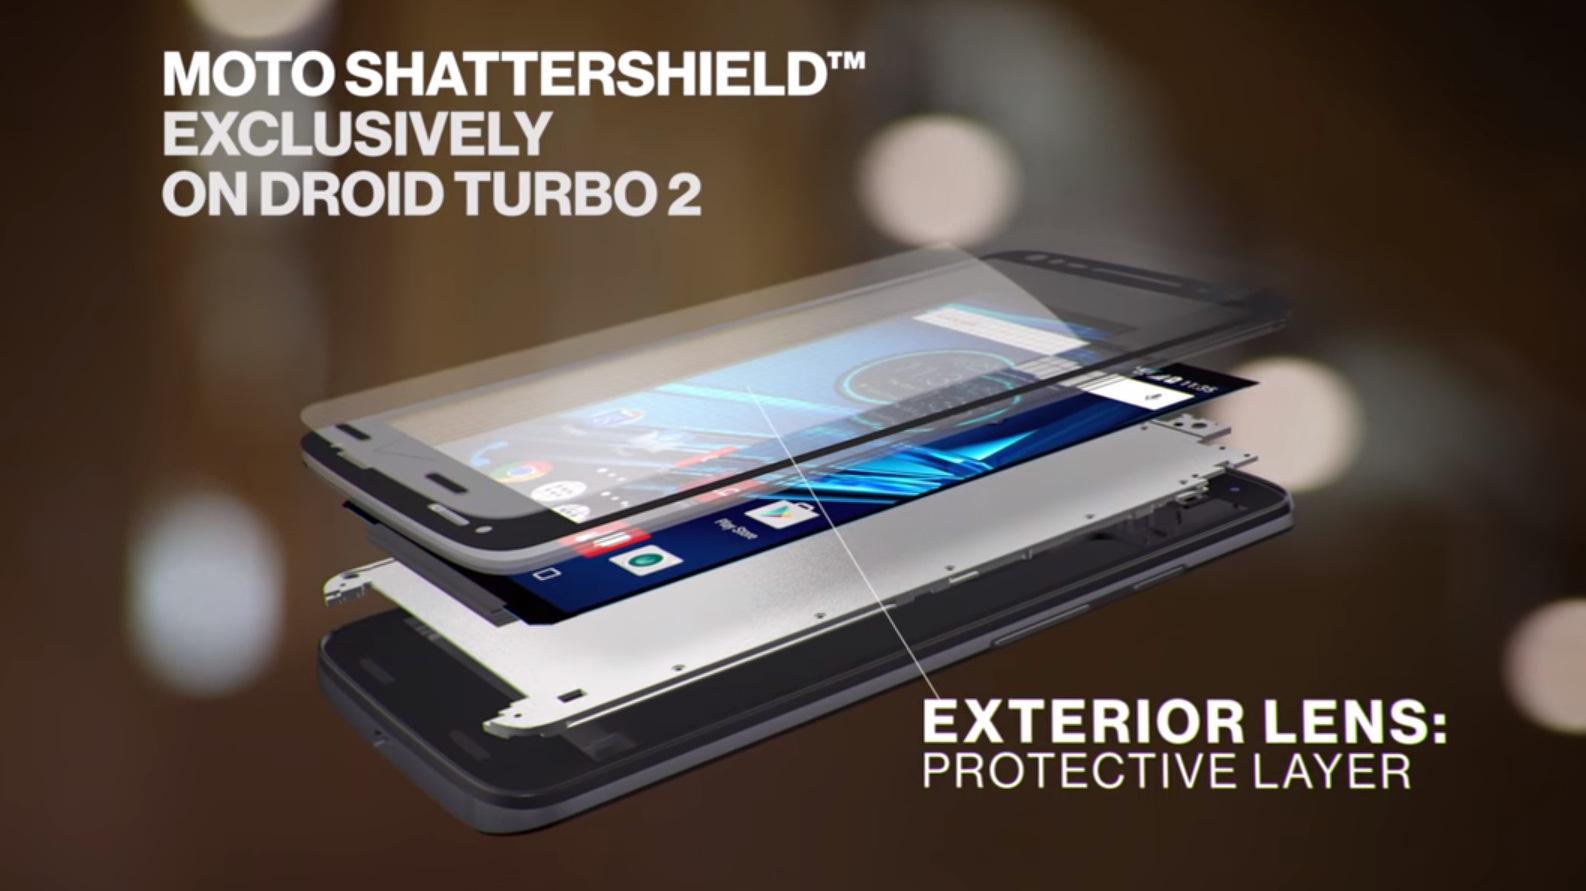 Motorola Doird Turbo 2 (6)